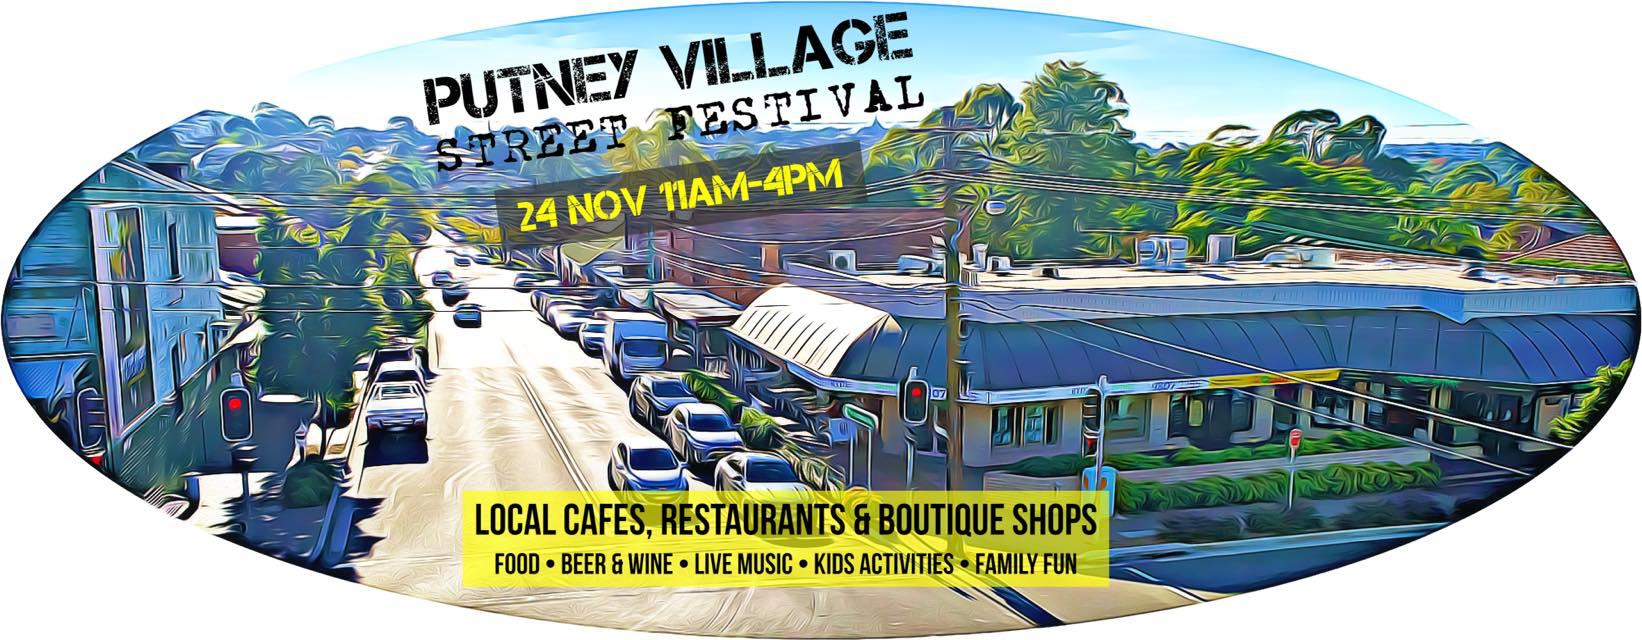 Putney Village Street Fest